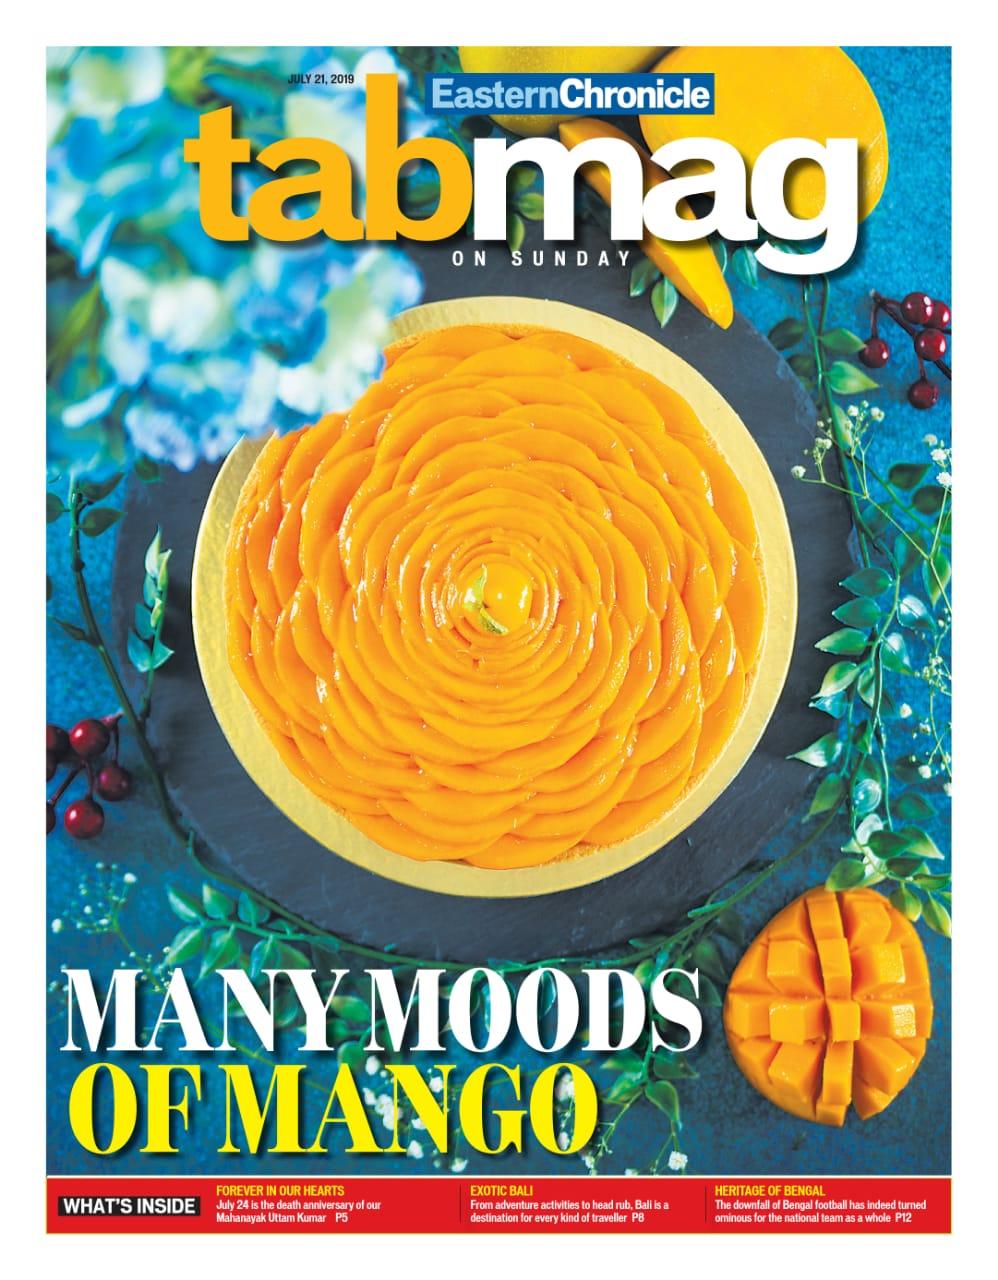 Eastern Chronicle Mango mania